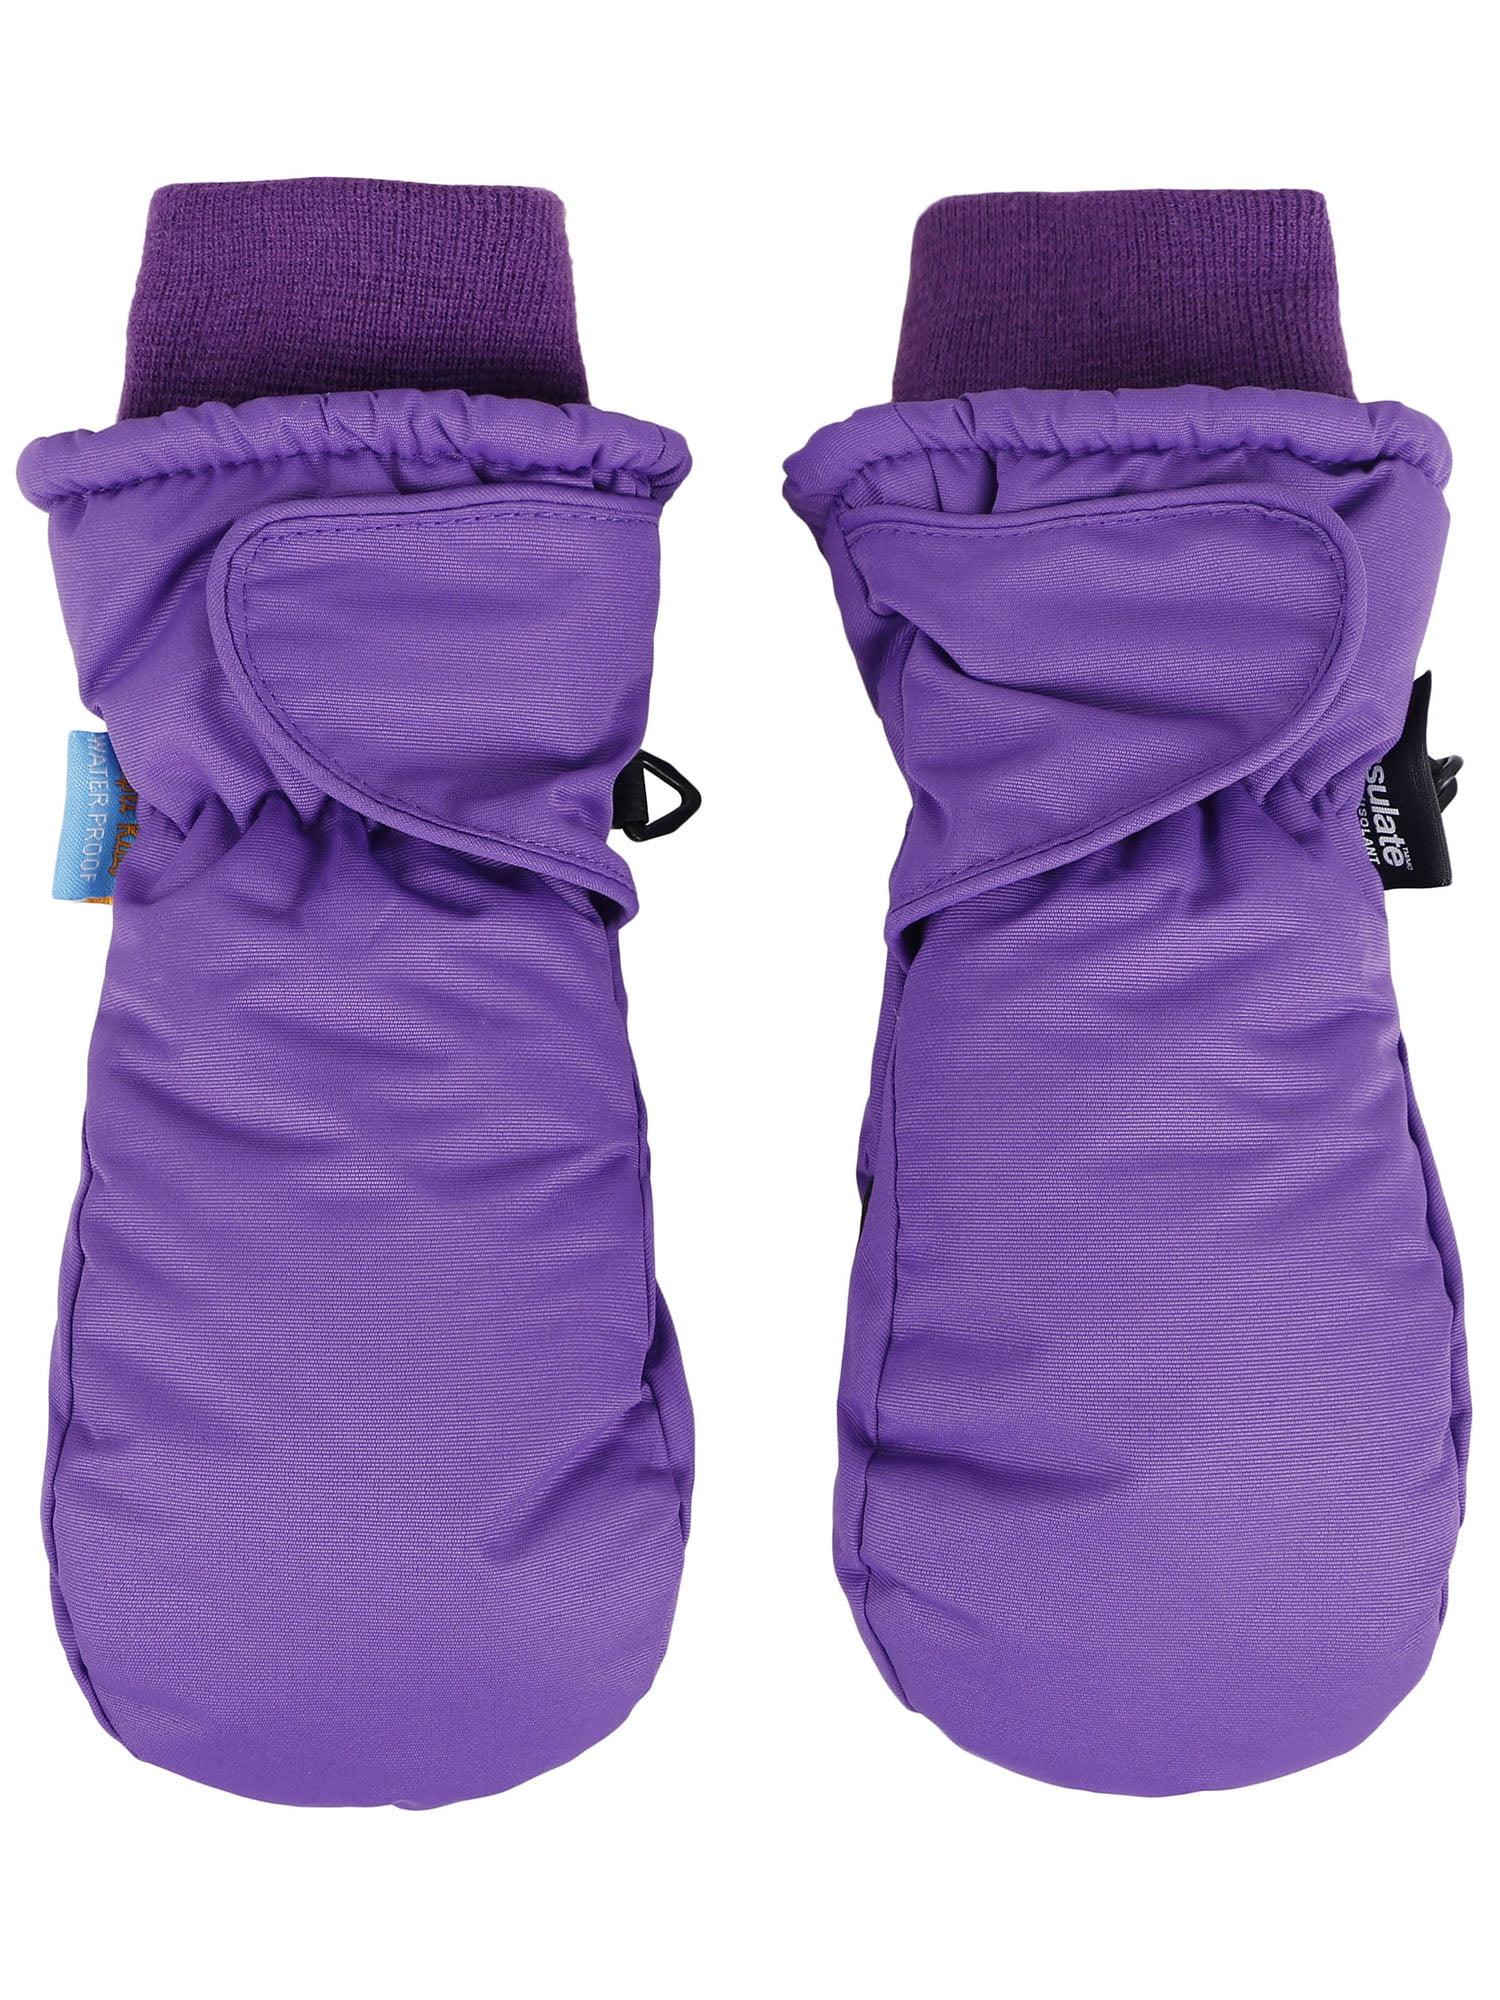 SimpliKids Childrens Snow Sports Insulation Waterproof Winter Ski Mittens,XS,Purple